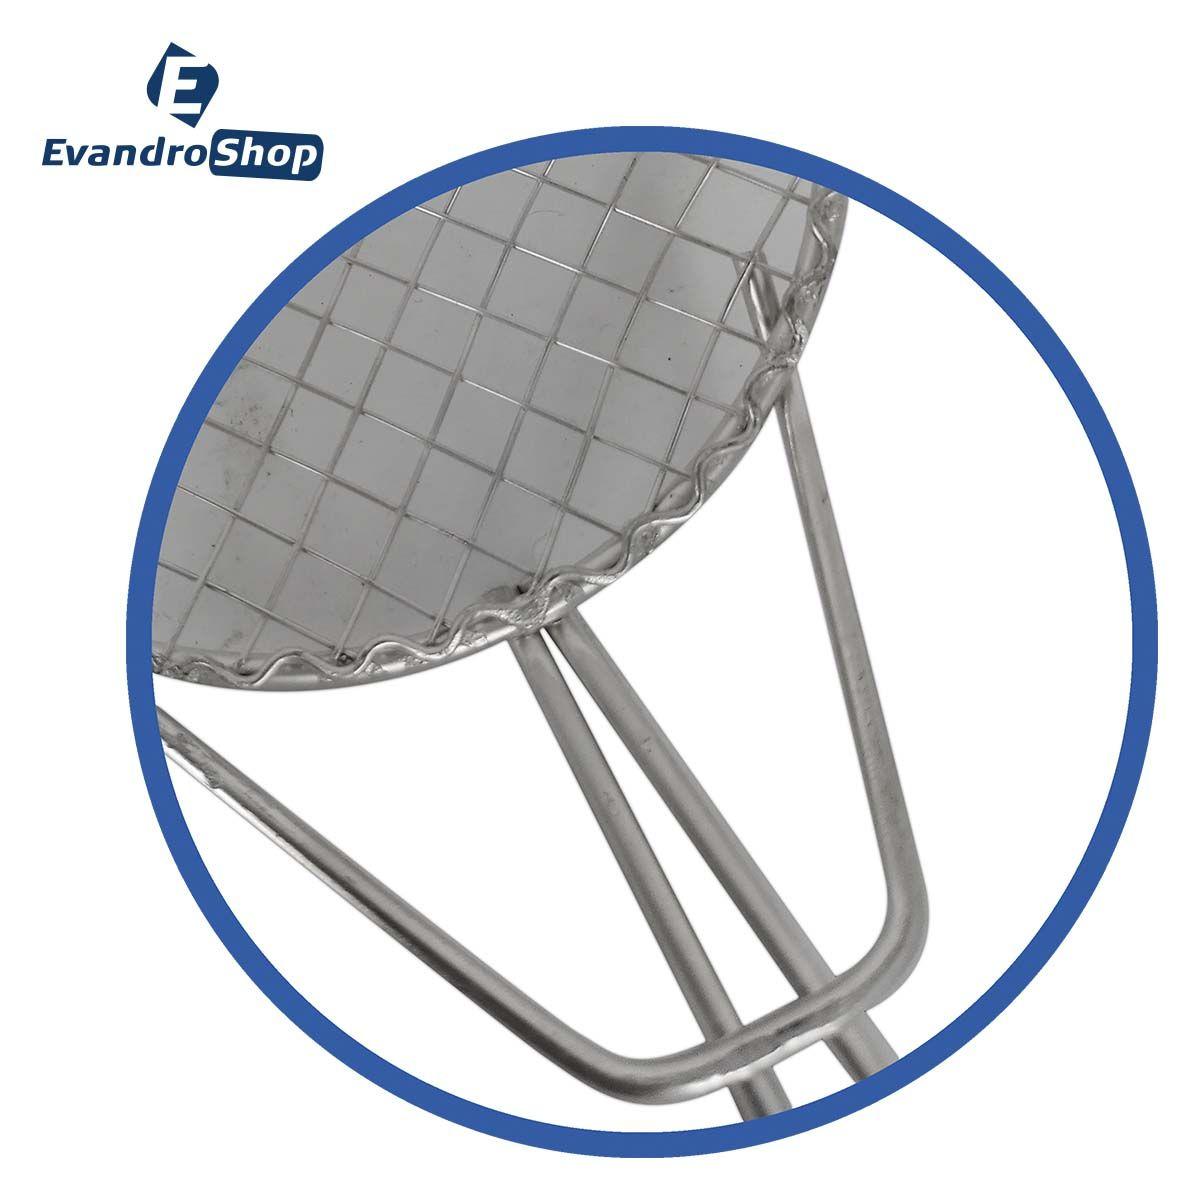 Escumadeira De Fritura N10 Galvanizada - Alemtex